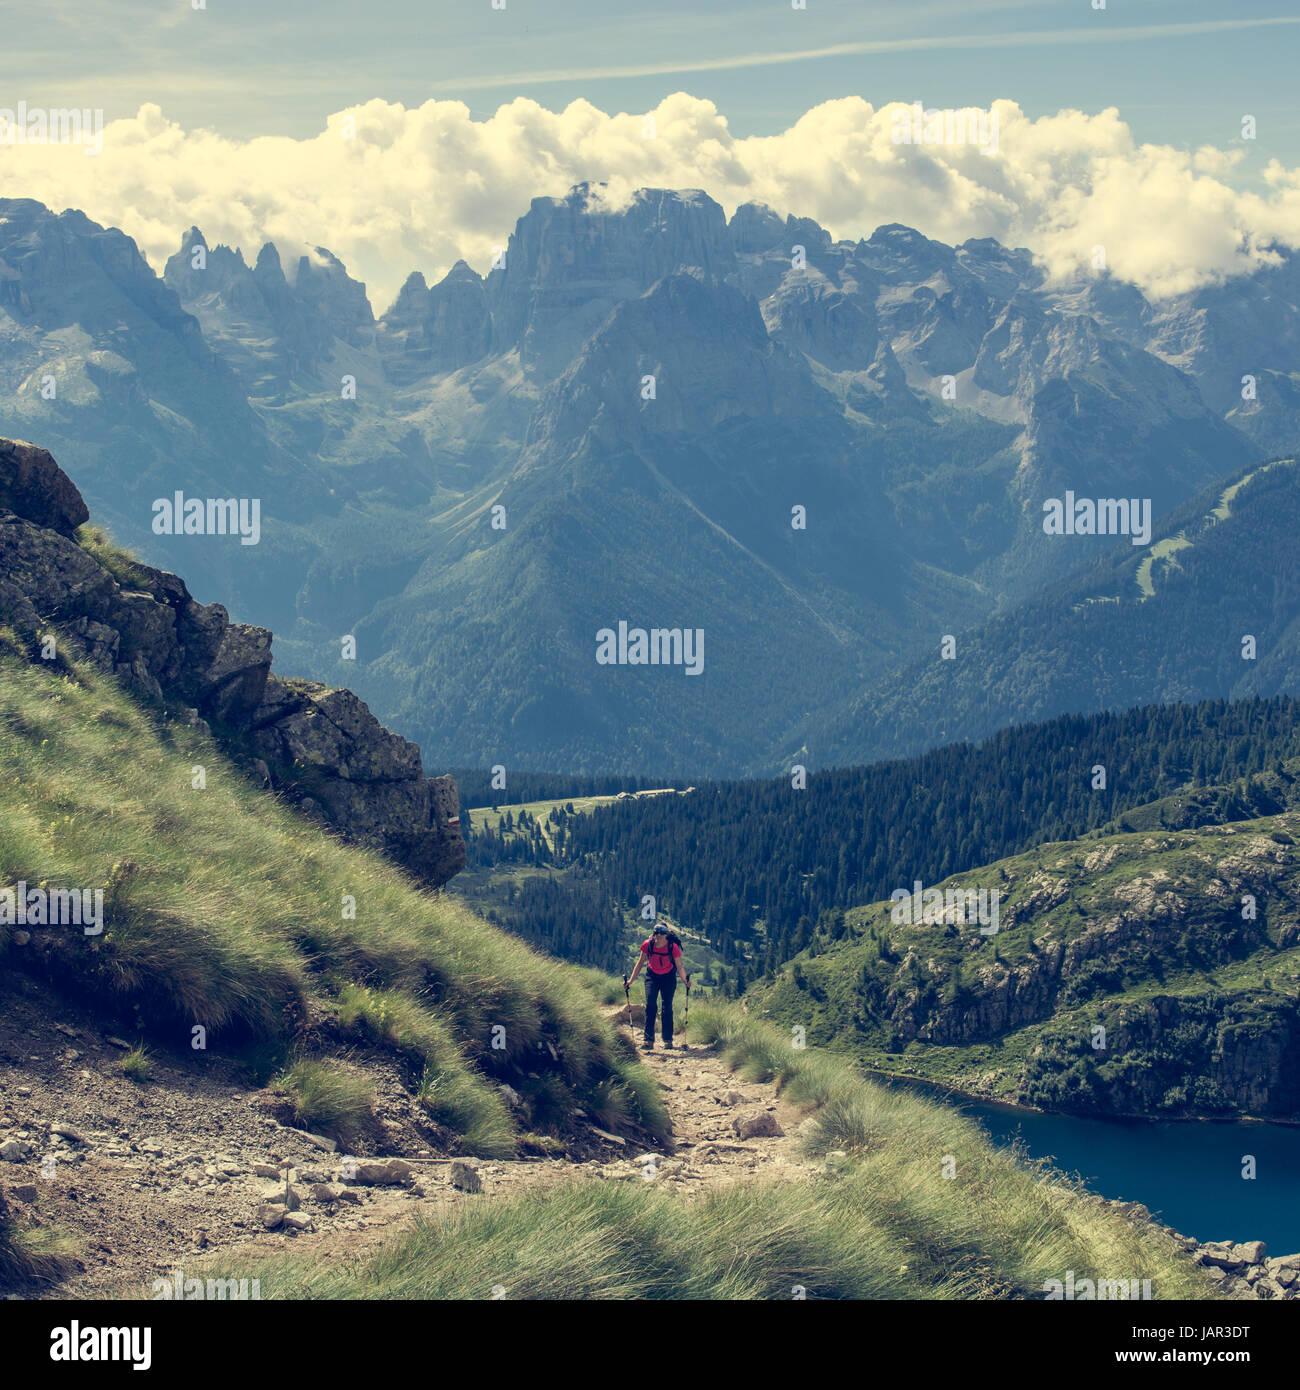 Trekker walking a picturesque mountain trail. - Stock Image